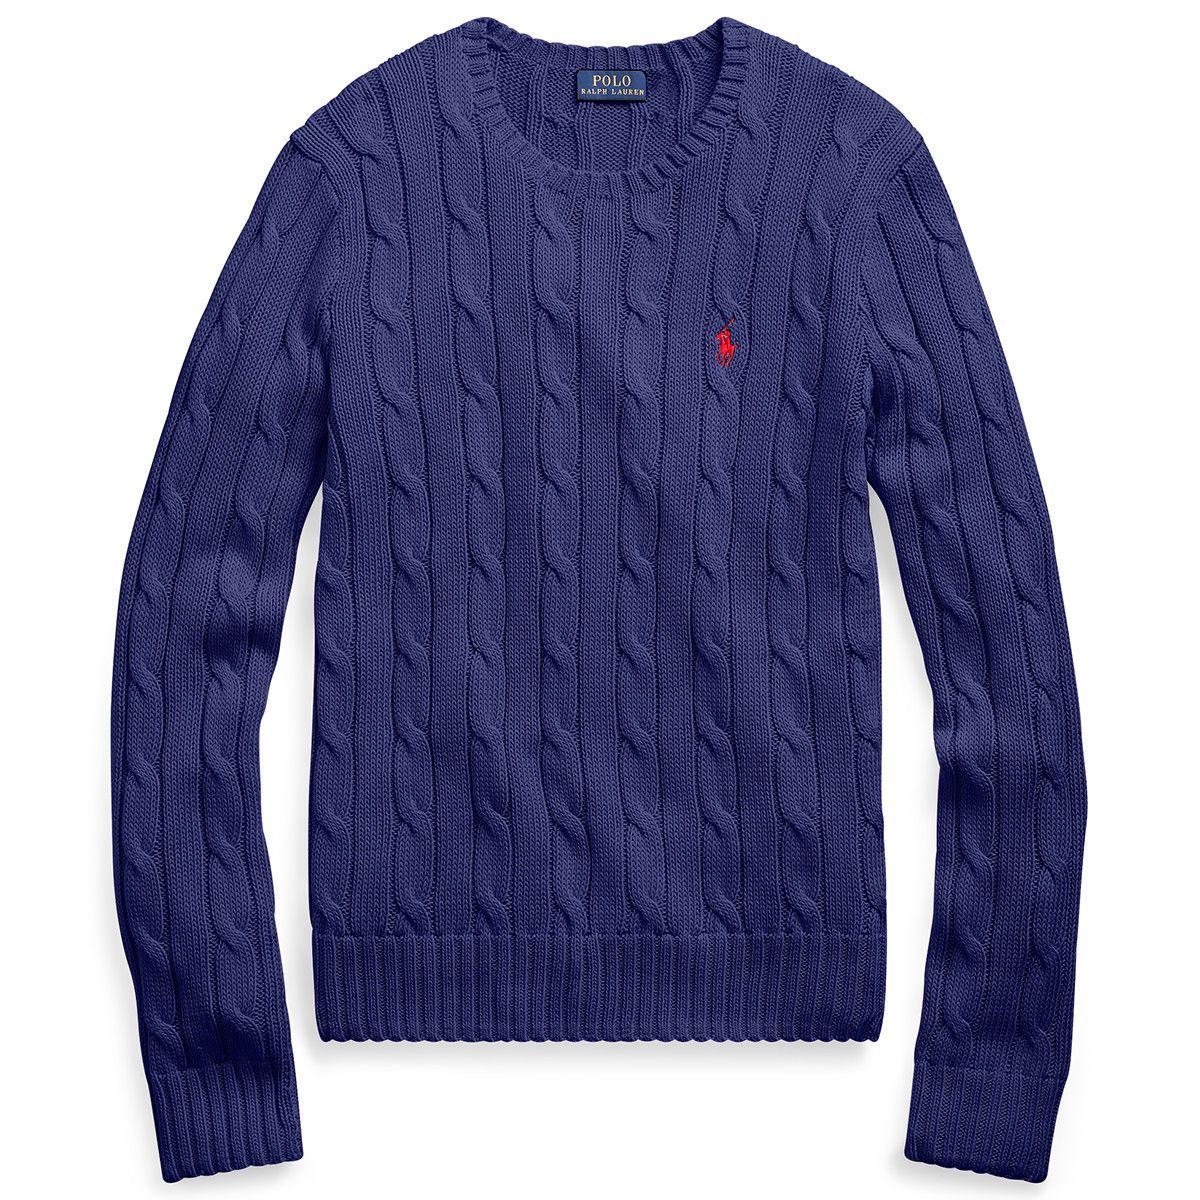 67739a0f33a Womens Polo by Ralph Lauren - Macy s